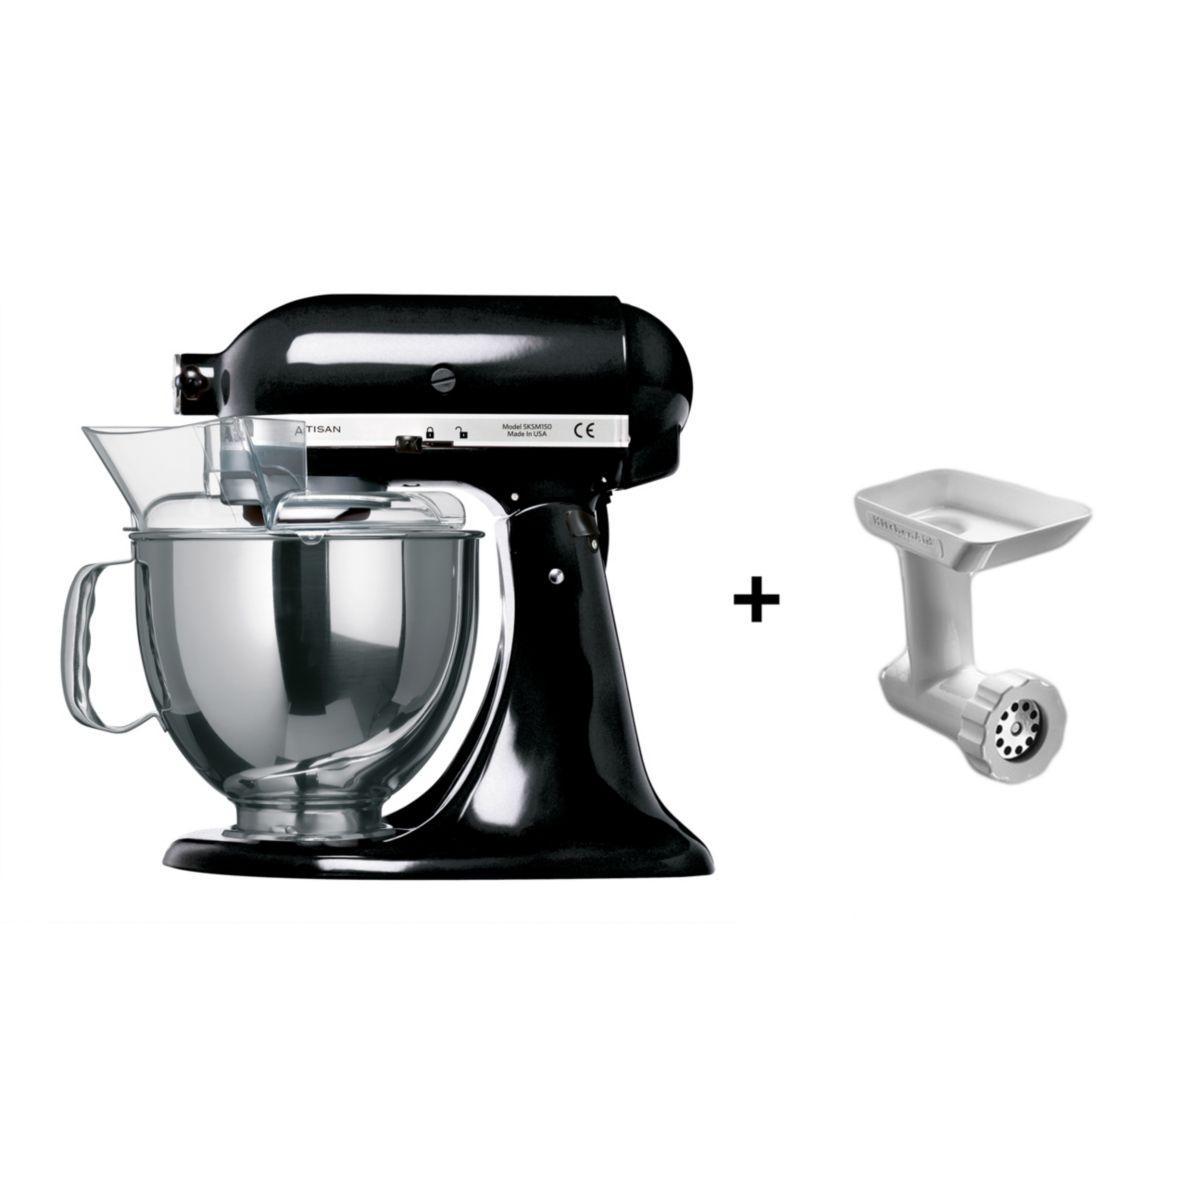 Robot pâtissier KITCHENAID 5KSM150PSEOB noir + hachoir 5FGA